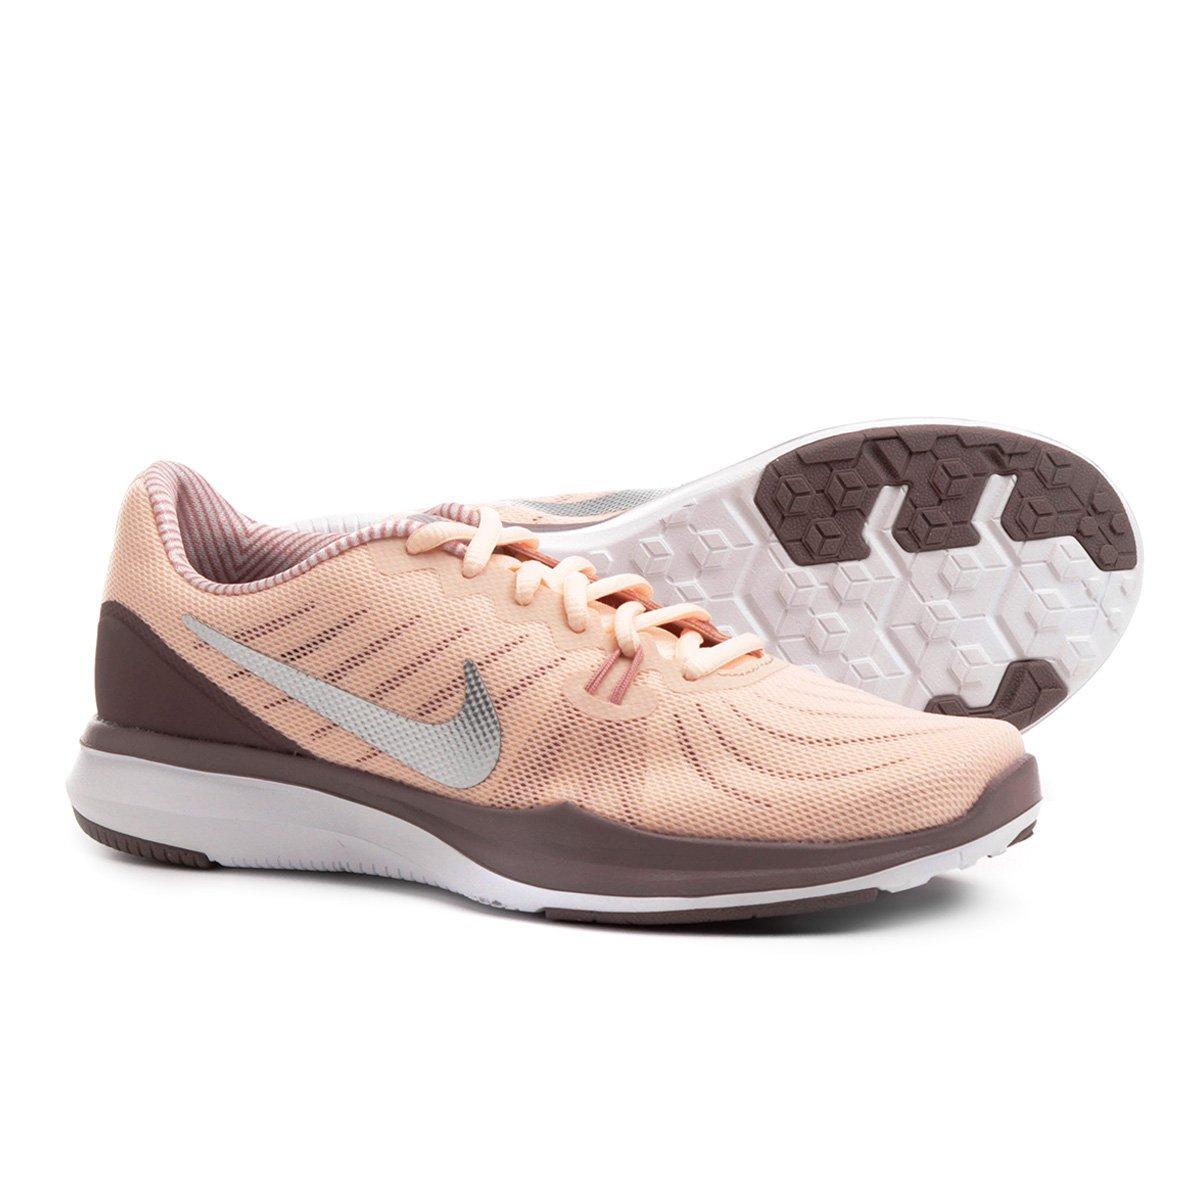 Tênis Nike In-Season TR 7 BN Feminino - Compre Agora  2d035ba60b327